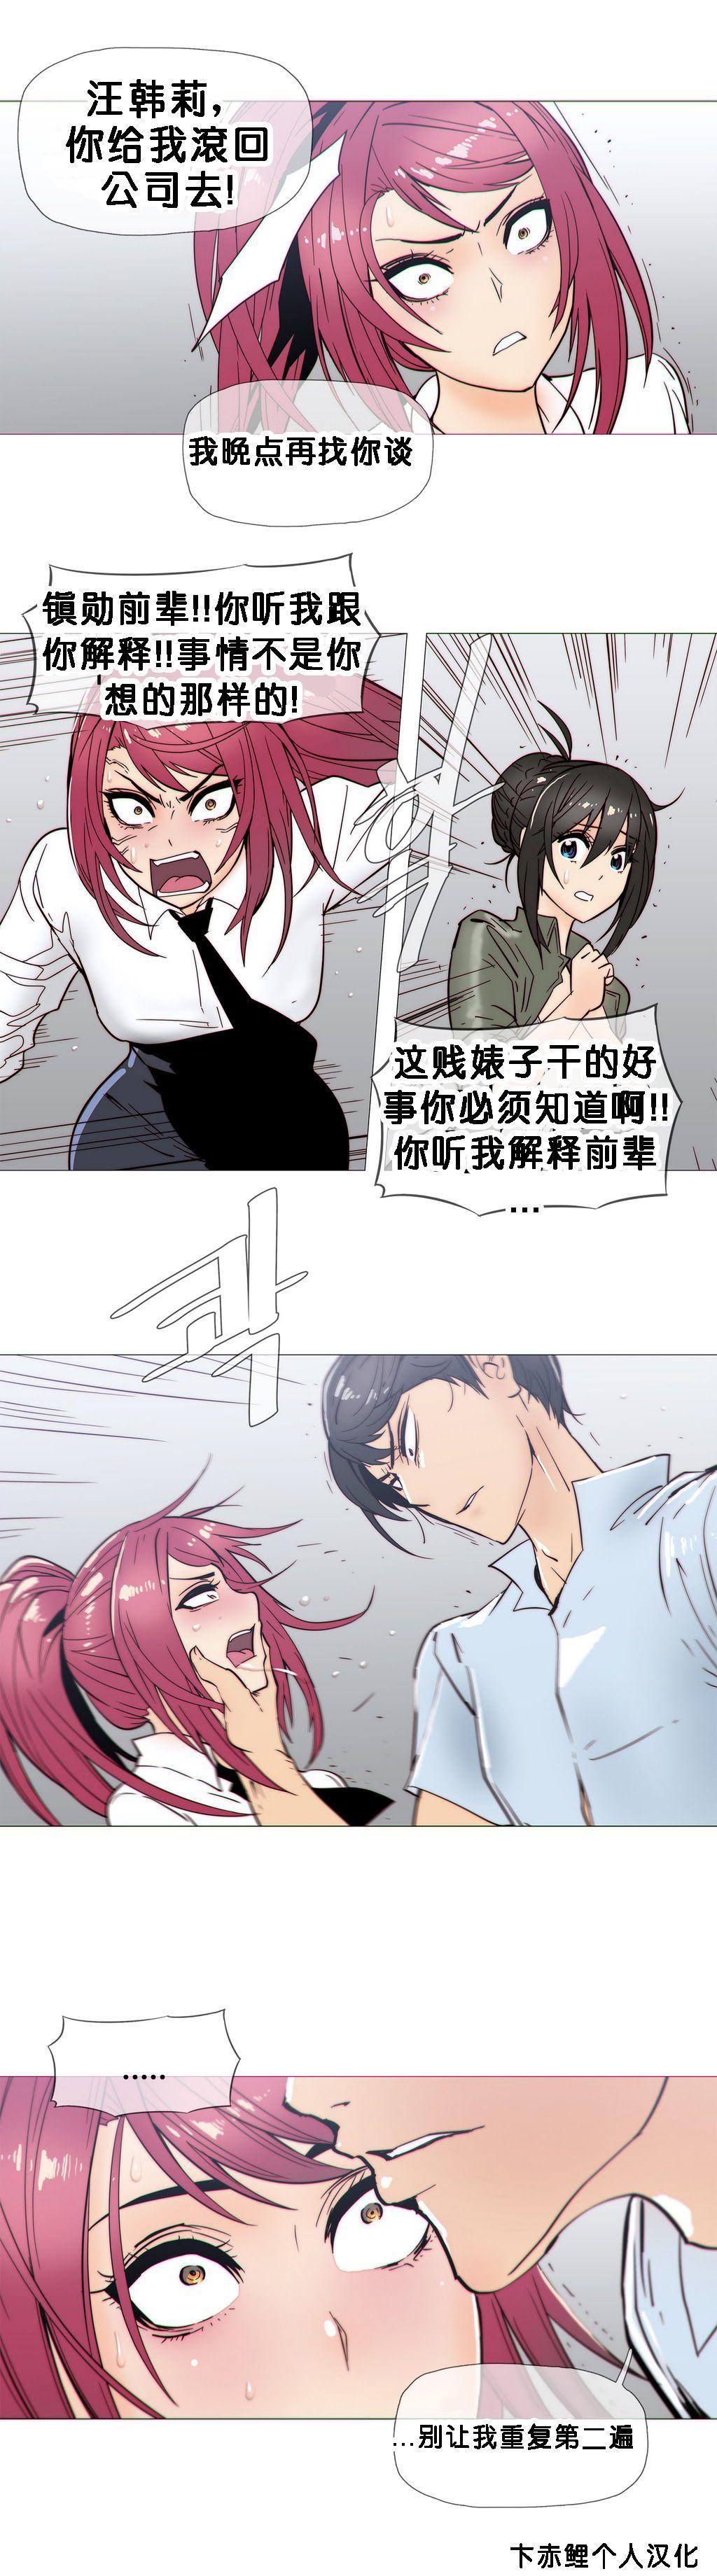 HouseHold Affairs 【卞赤鲤个人汉化】1~33话(持续更新中) 503